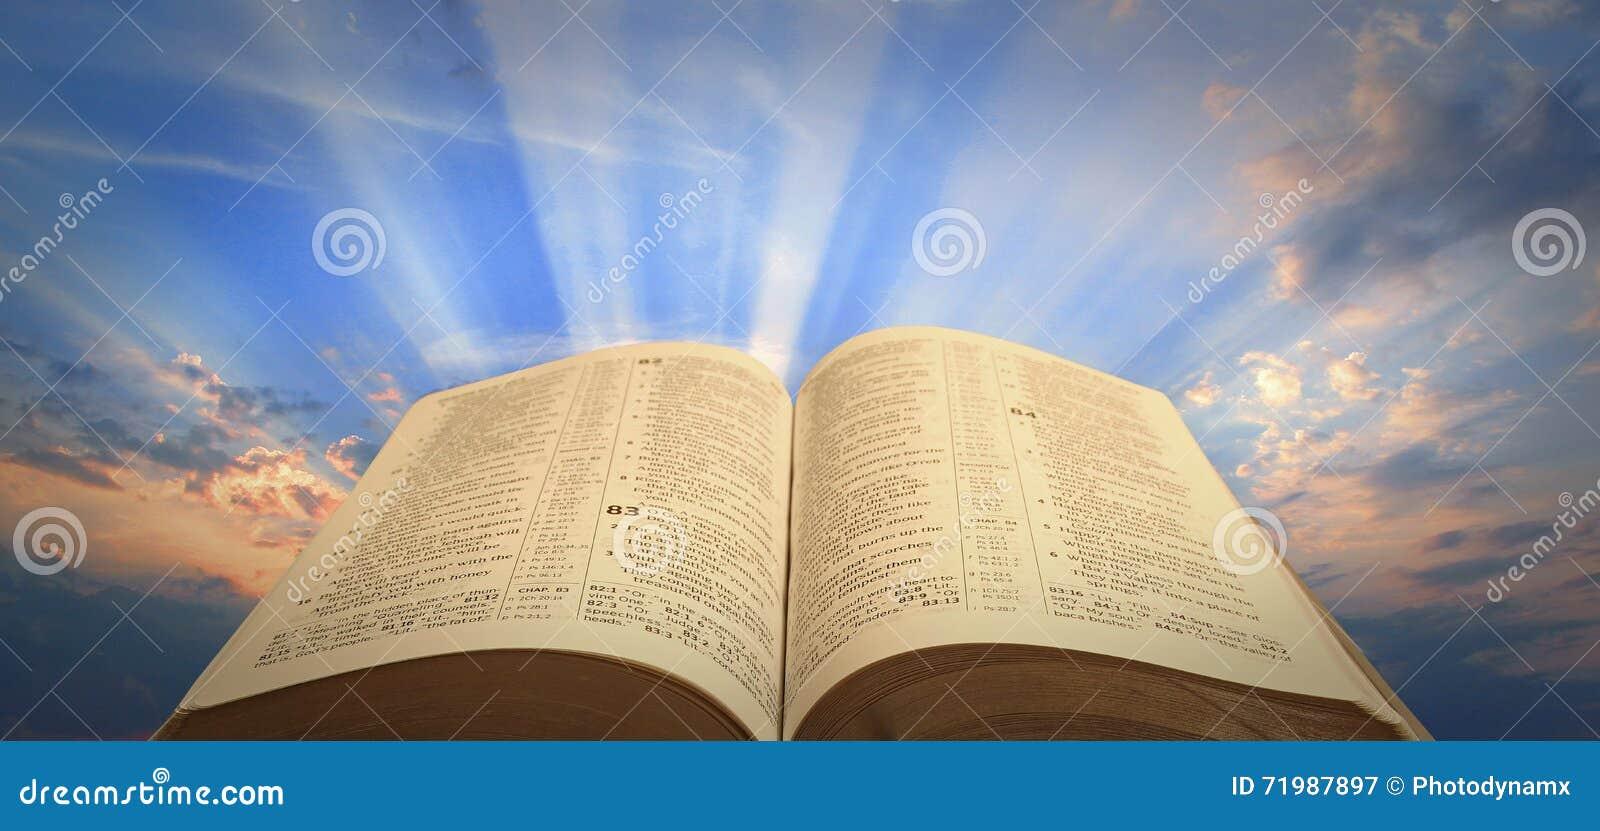 Geistige helle Bibelhoffnung